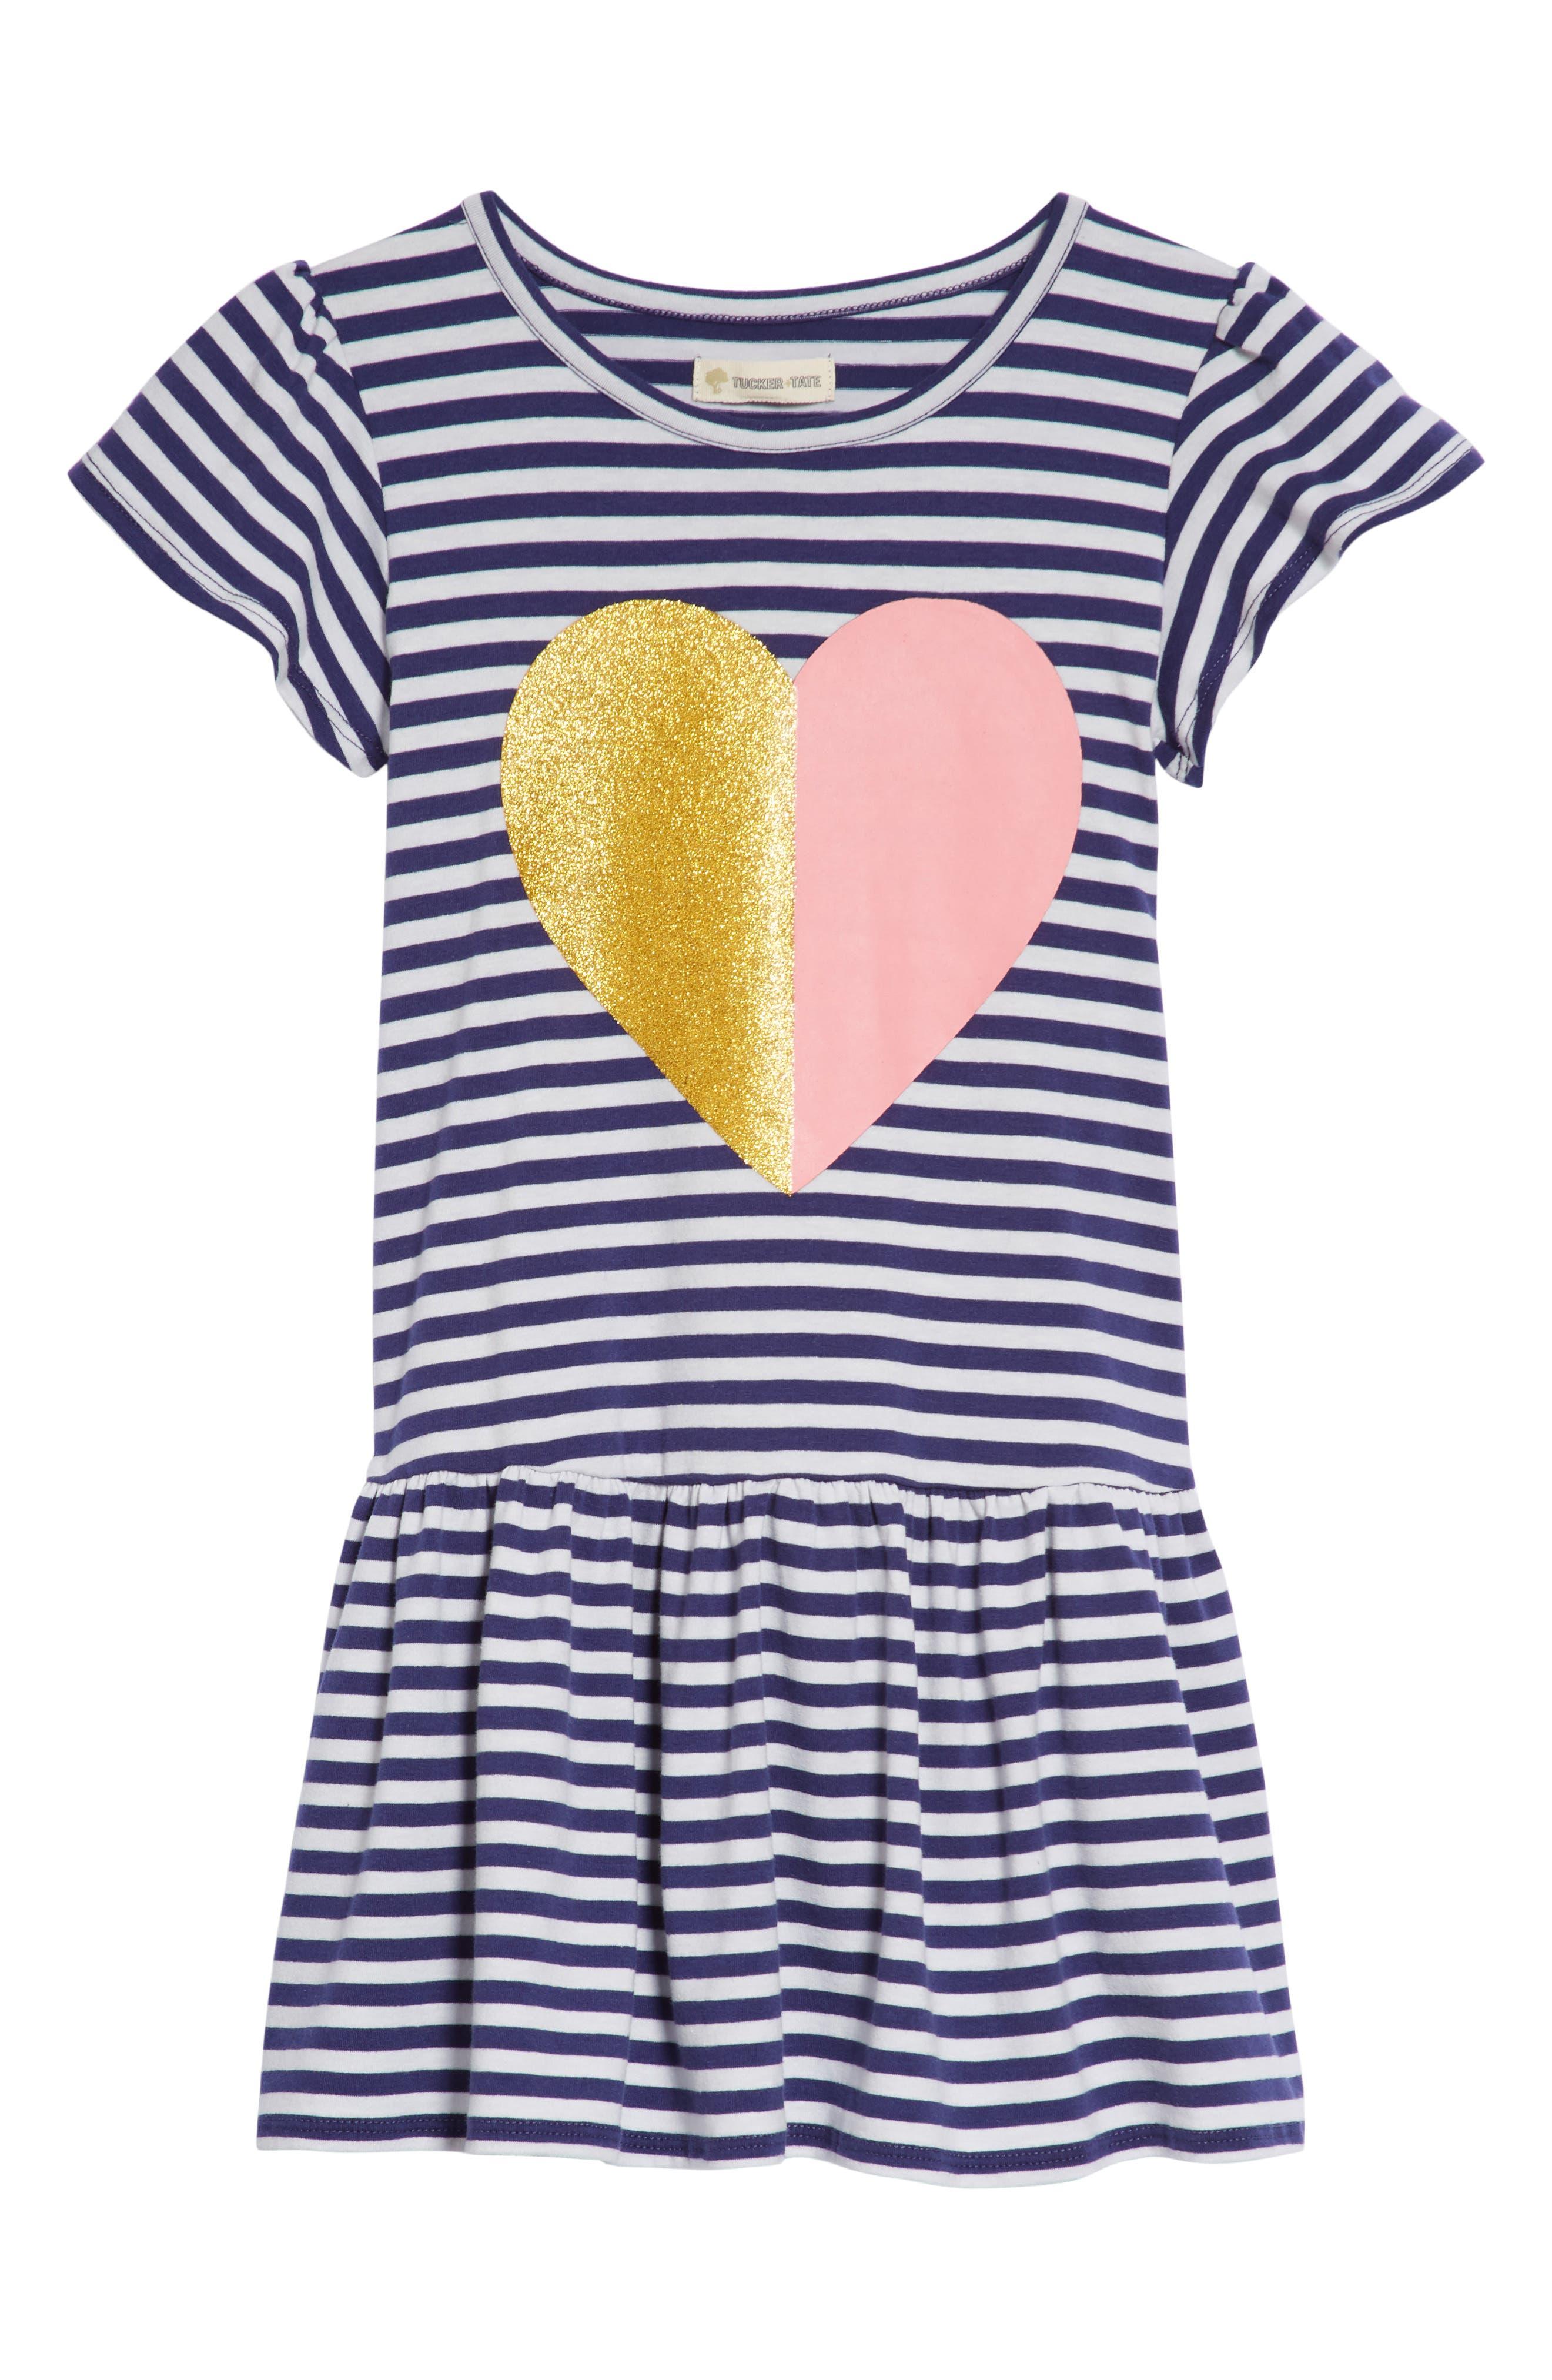 Graphic Stripe Dress,                         Main,                         color, Navy Ribbon Sparkle Heart